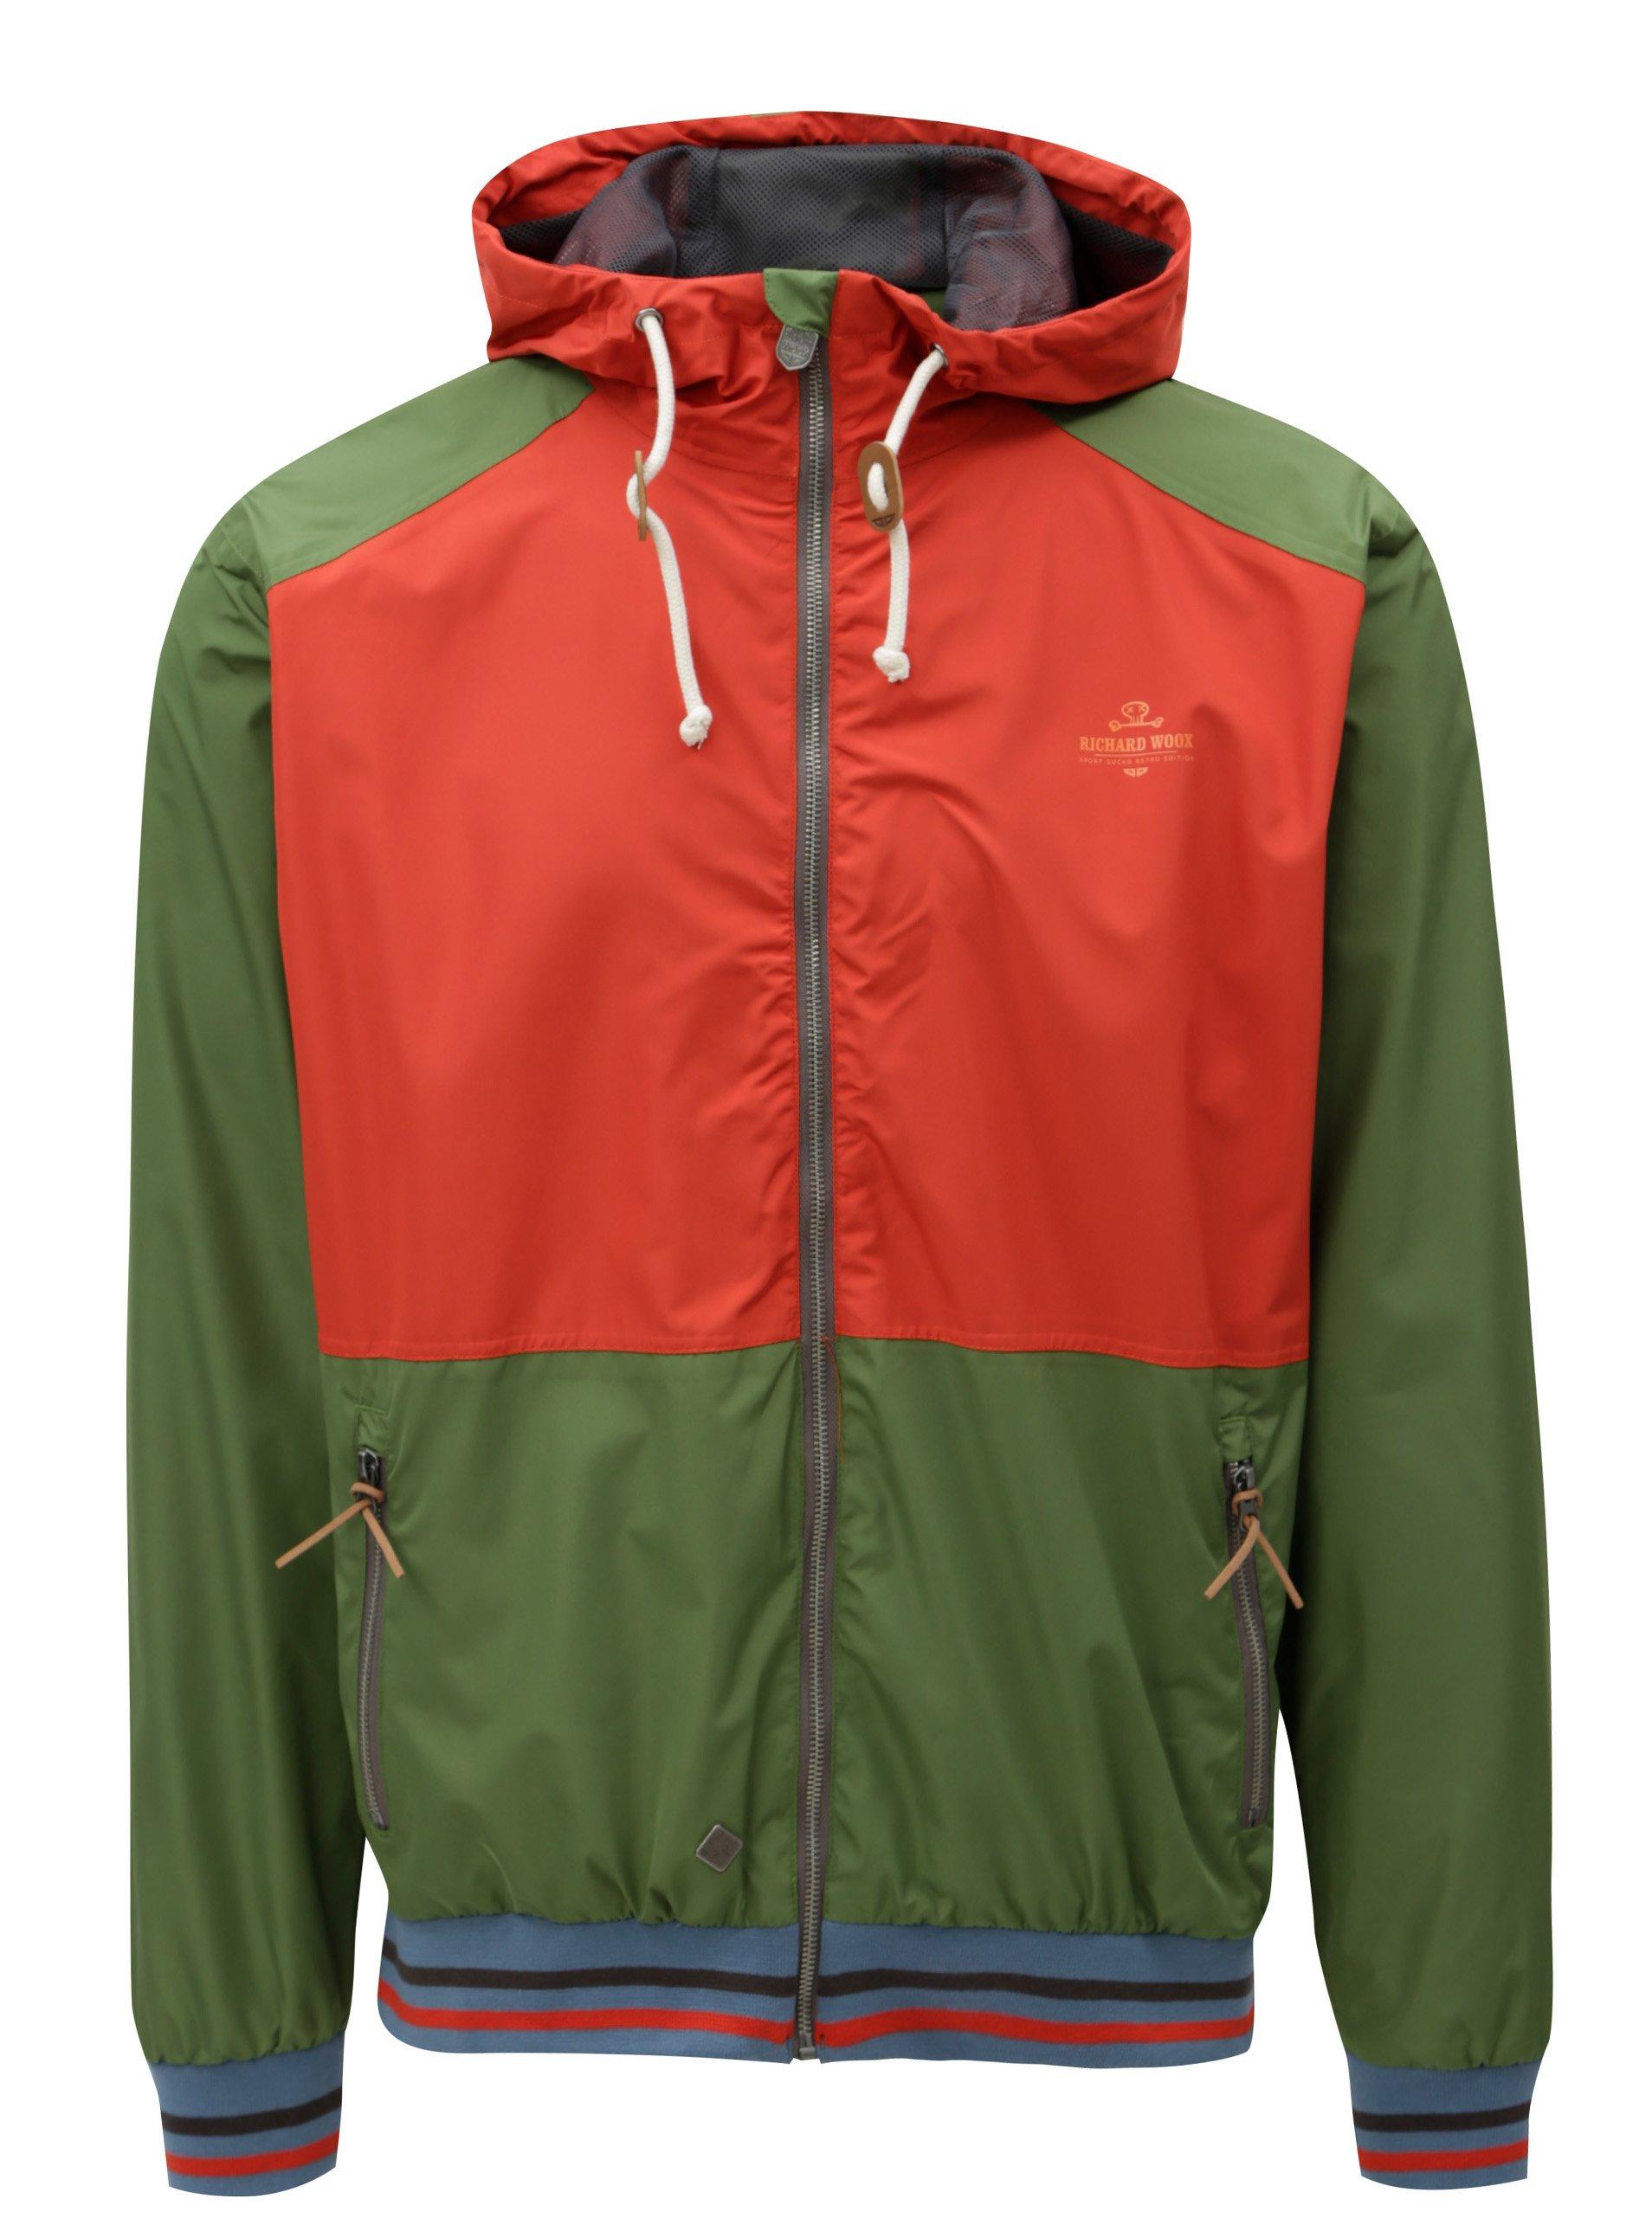 Červeno-zelená pánská nepromokavá lehká bunda WOOX Nimbus Urban Kale Senor